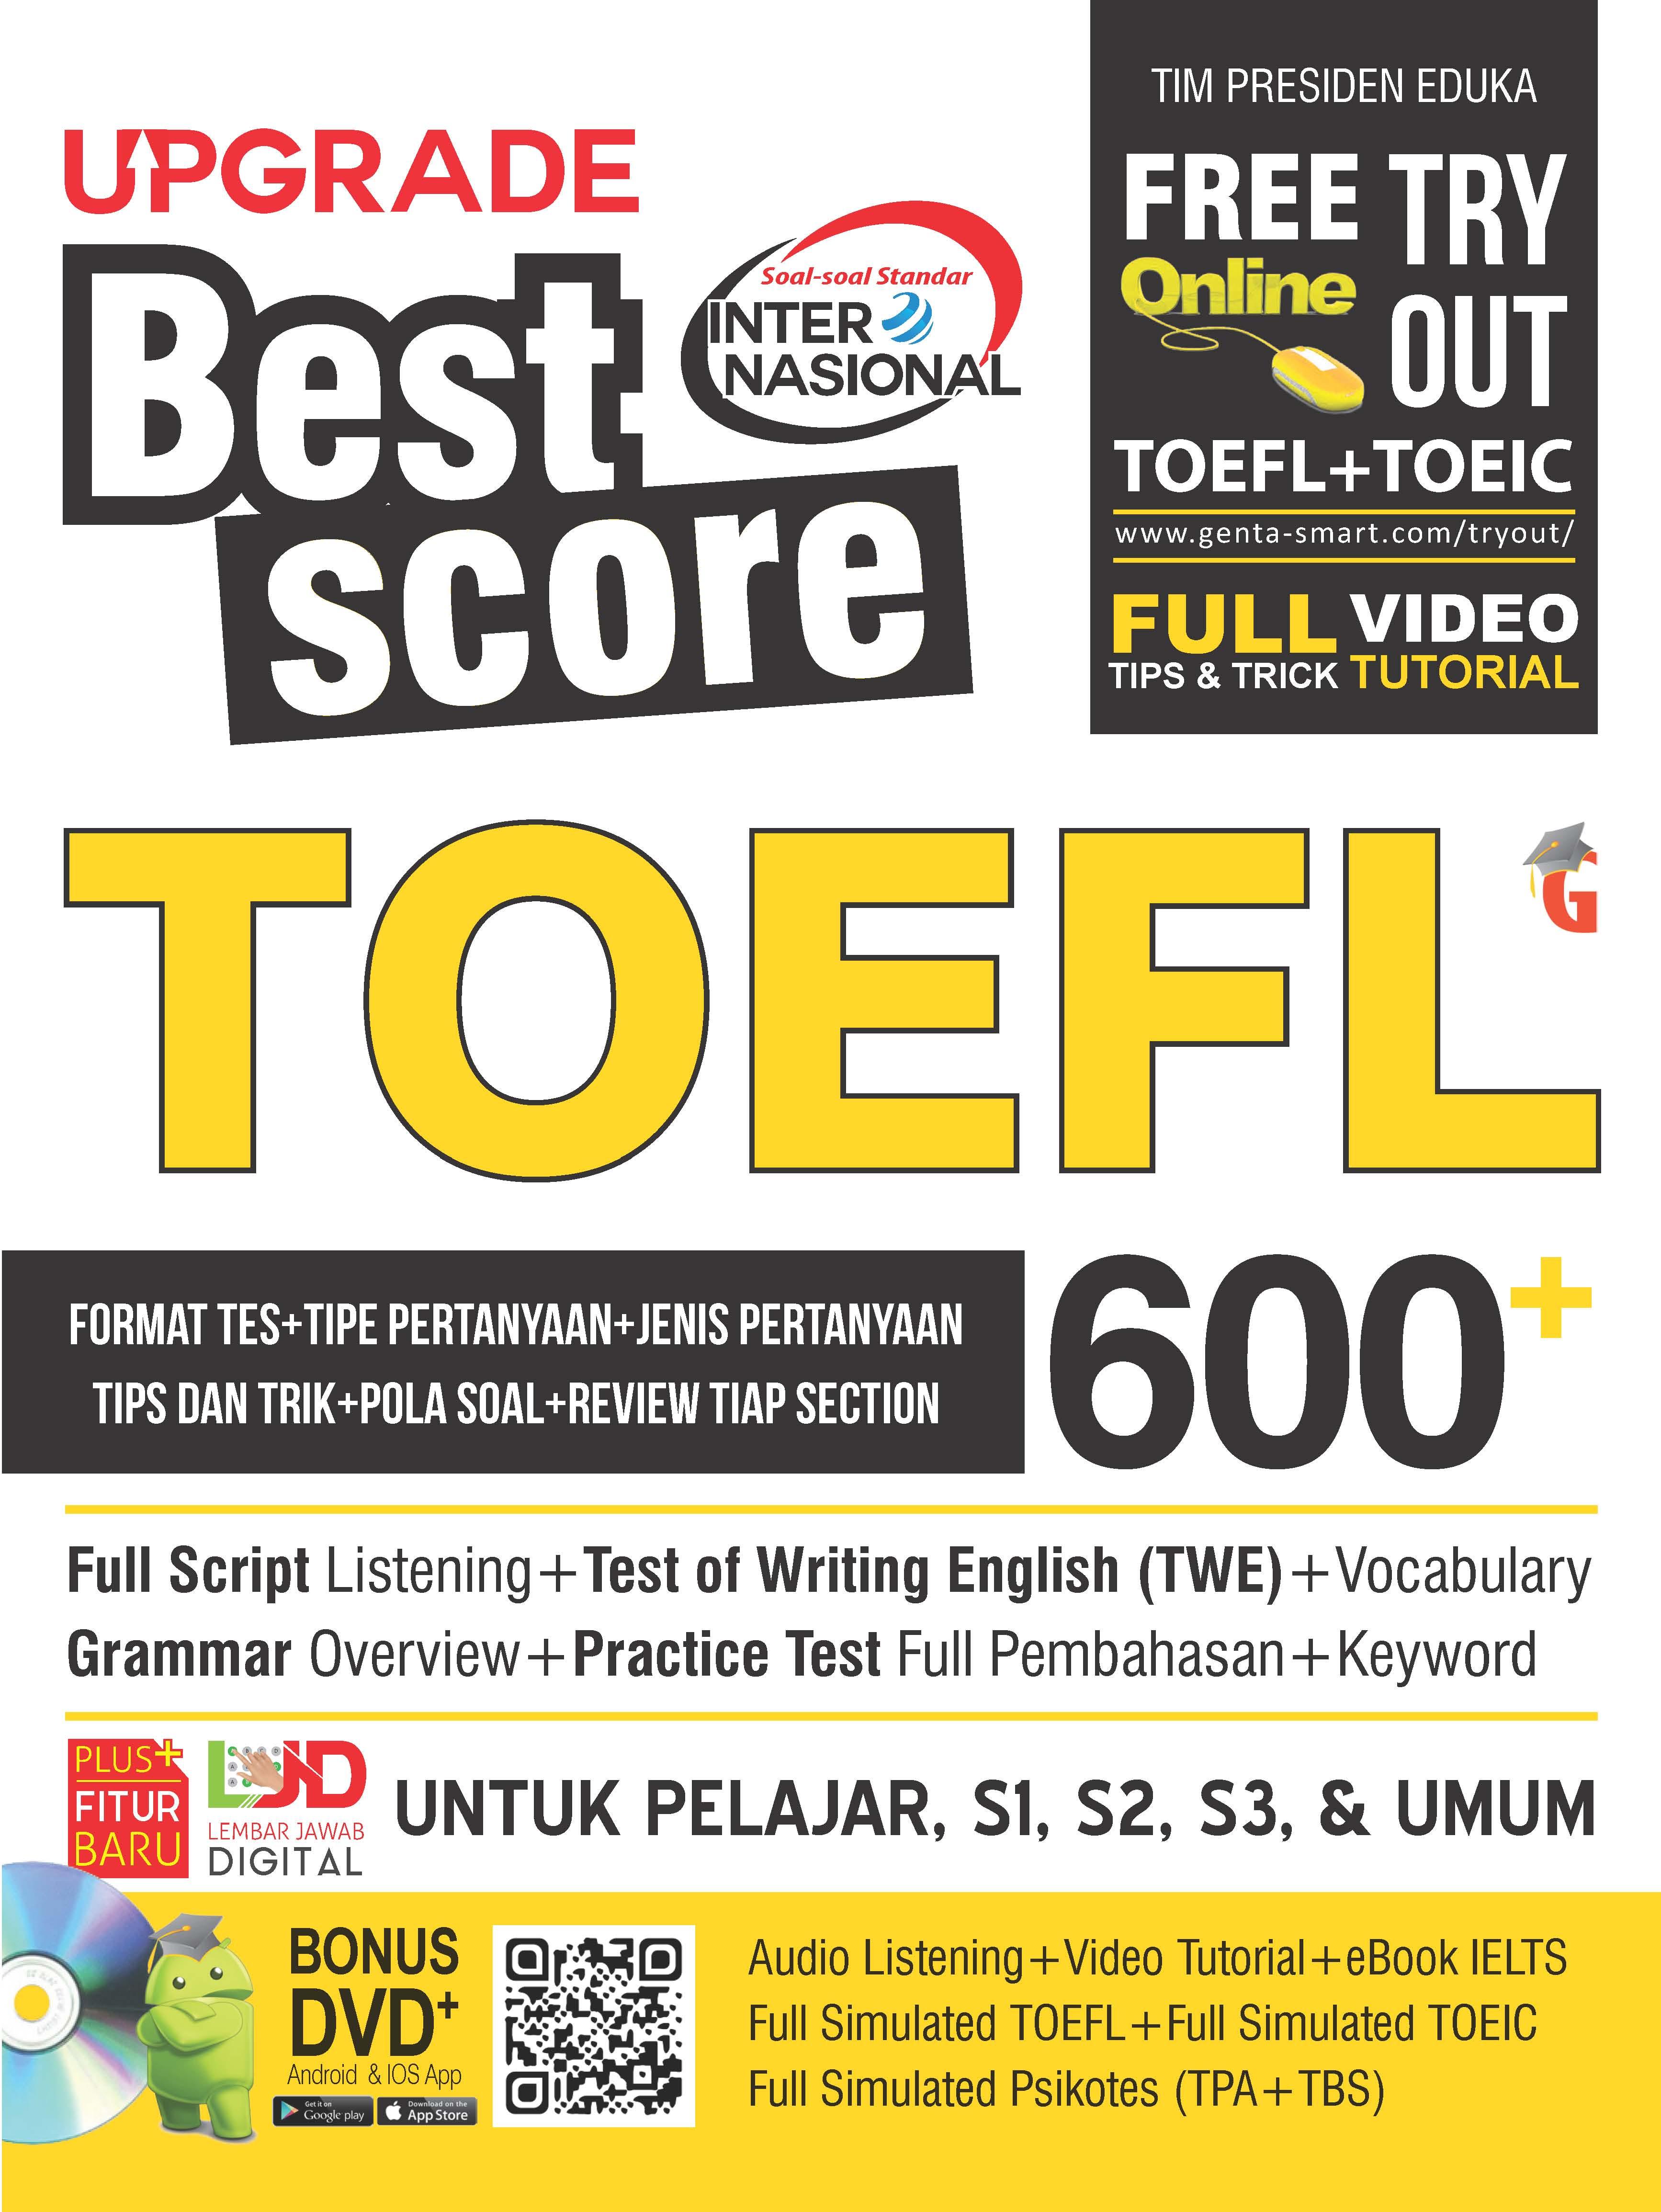 Upgrade best score TOEFL 600+ [sumber elektronis]